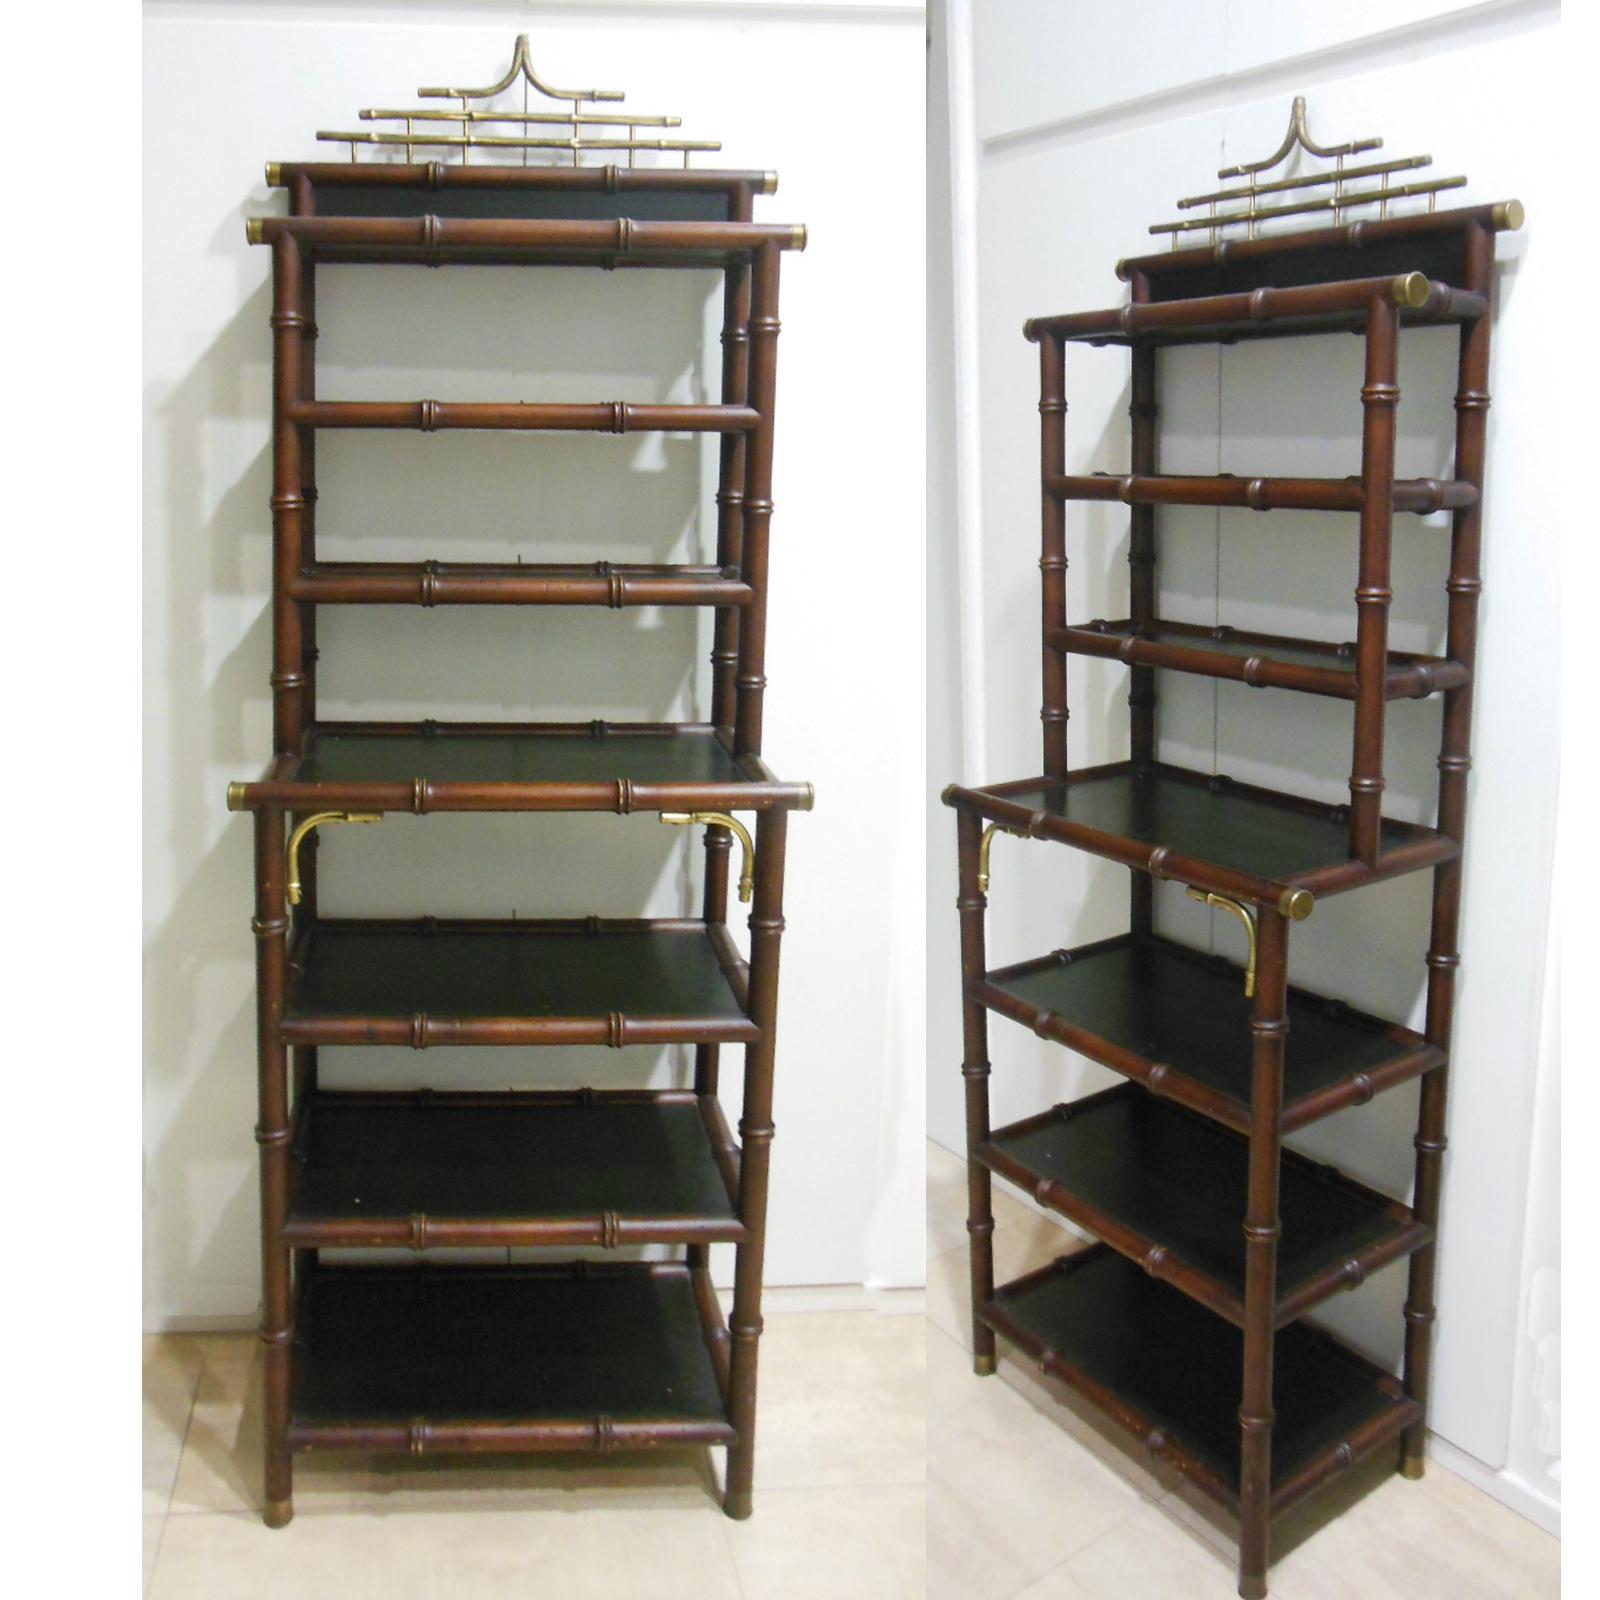 Estanteria de madera exotica estilo Maison Bagues bronce y falso bambu disponible en La Josa Shop